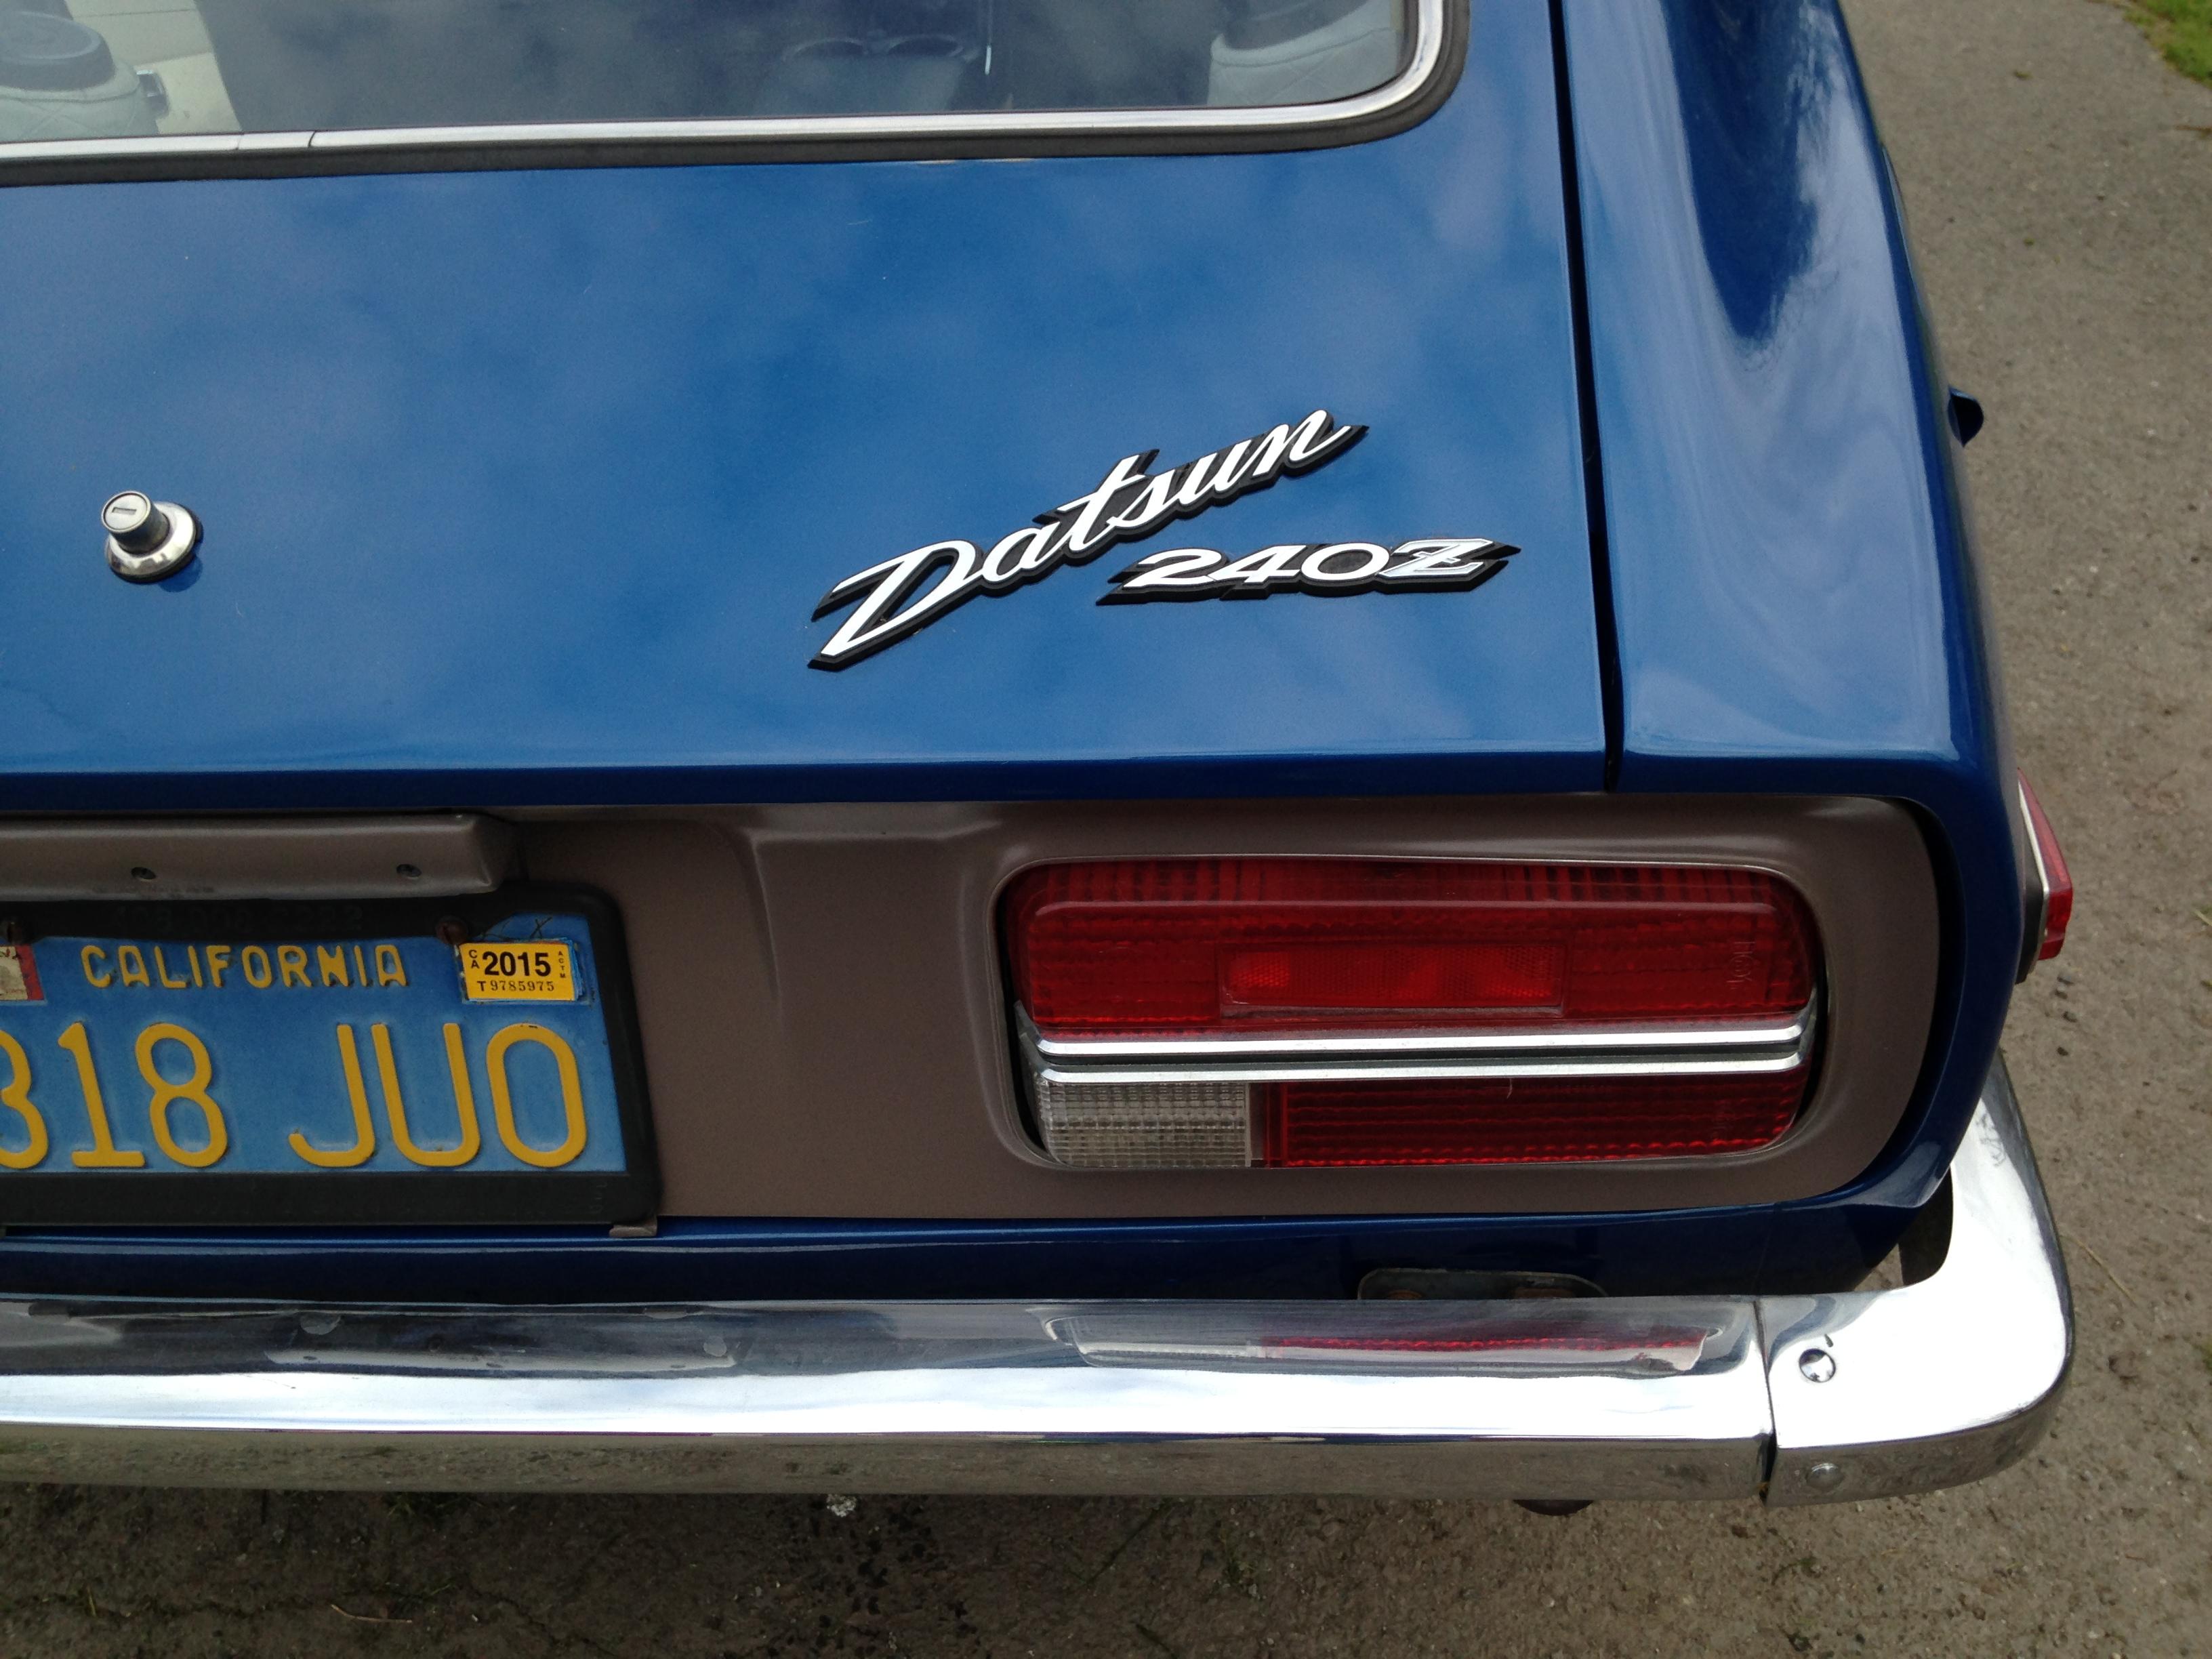 Datsun rear